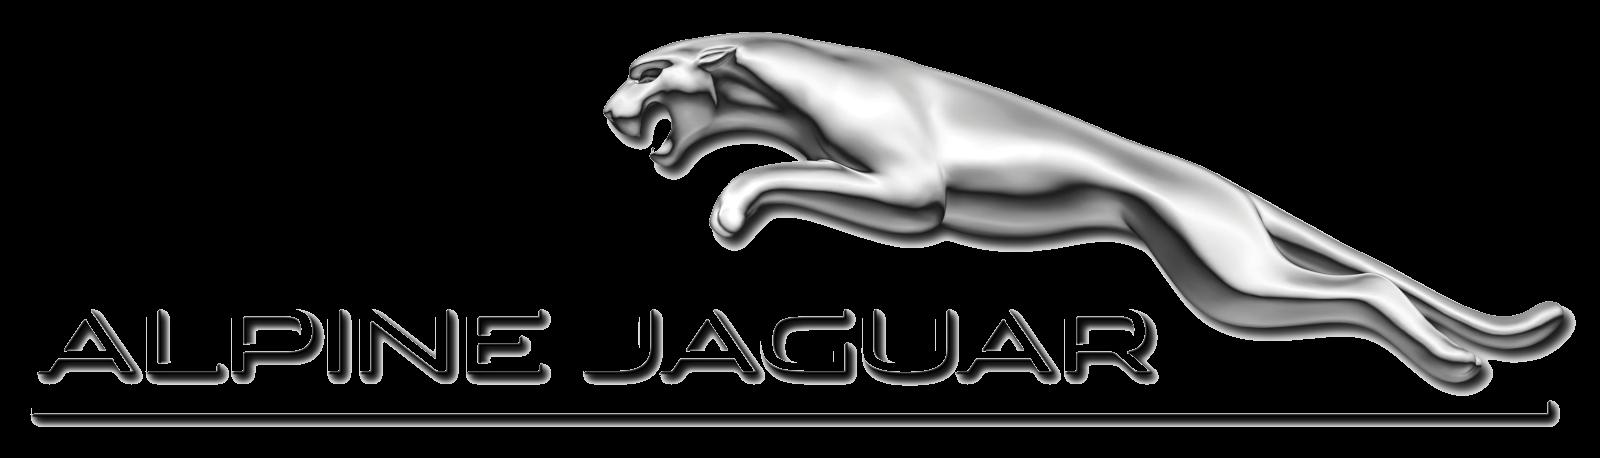 client-logos-Alpine Jaguar logo